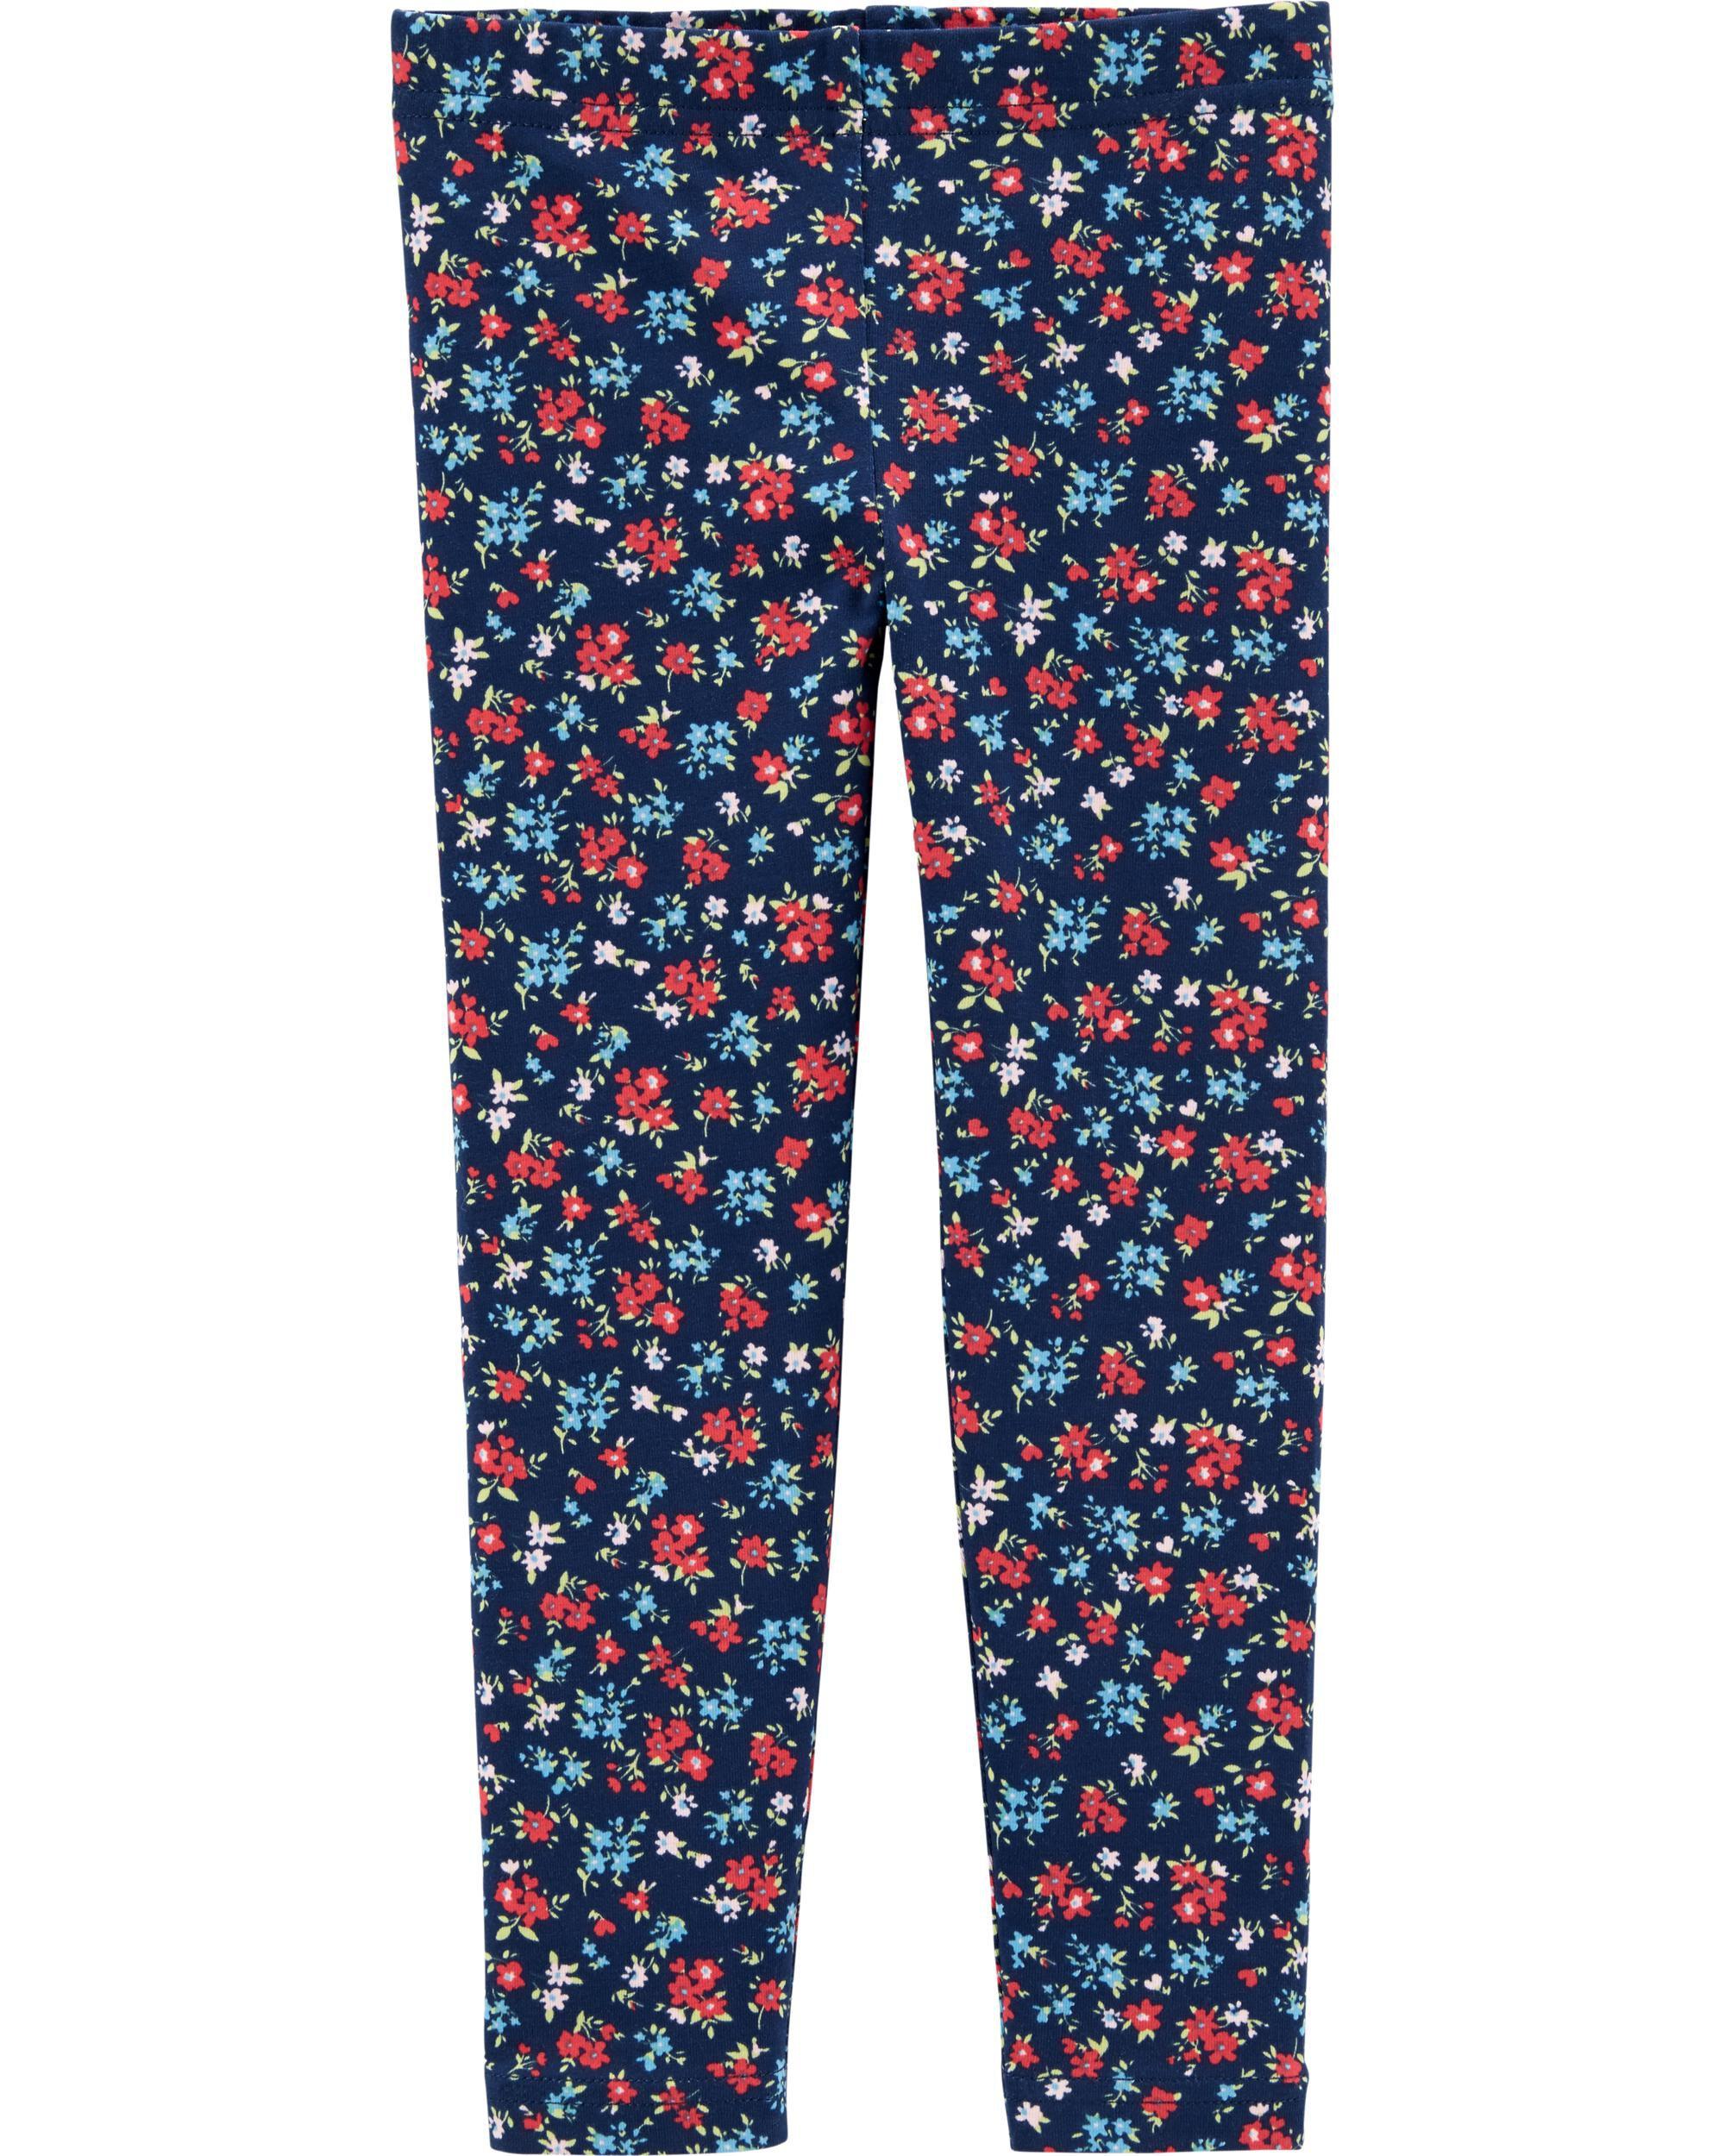 Carters Girls 2T-4T Floral Leggings